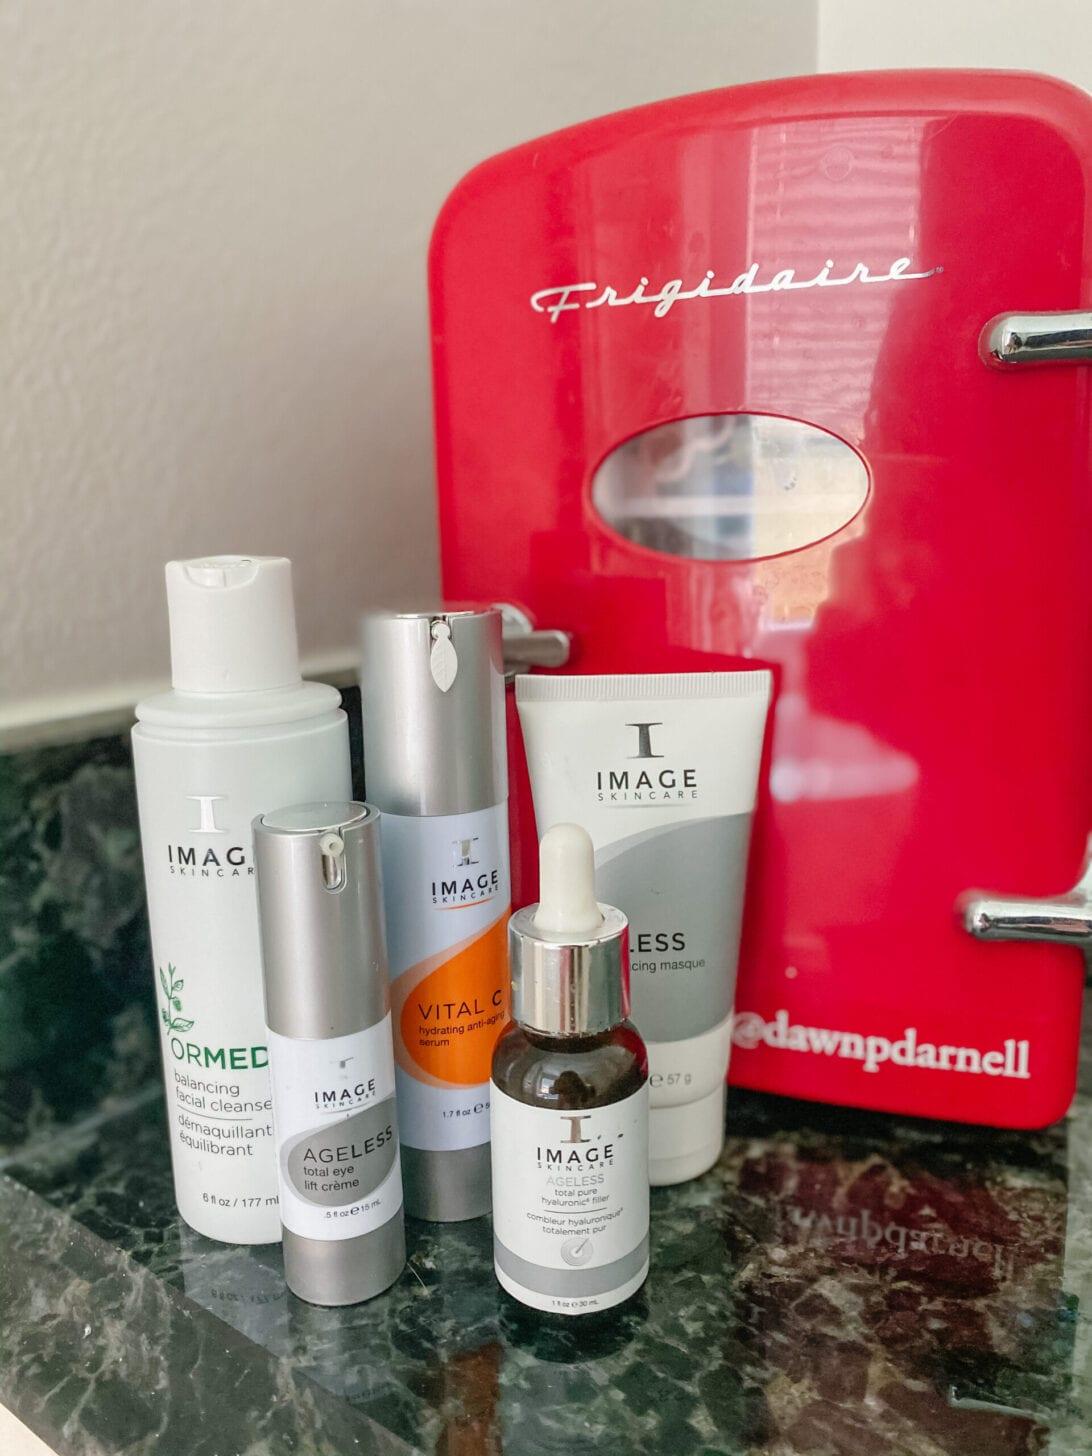 IMAGE SKINCARE, Fall Skincare Essentials, WALMART BEAUTY